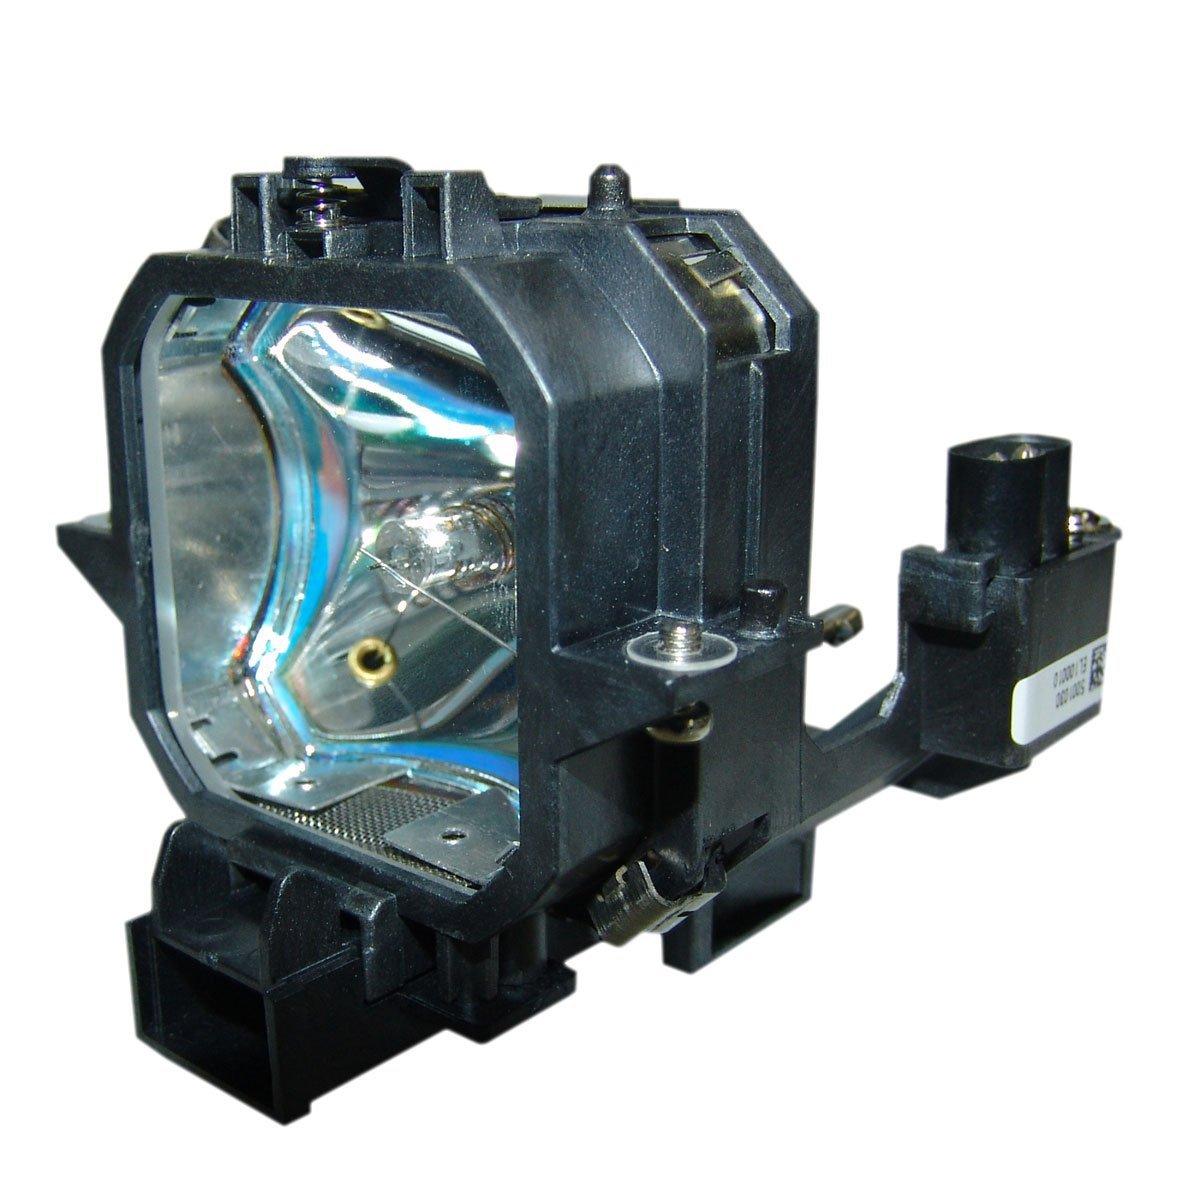 ELPLP21 V13H010L21 for Epson EMP-73 EMP-53 PowerLite 53C /PowerLite 73C Projector Lamp Bulb with housing туфли 73c 18 2014